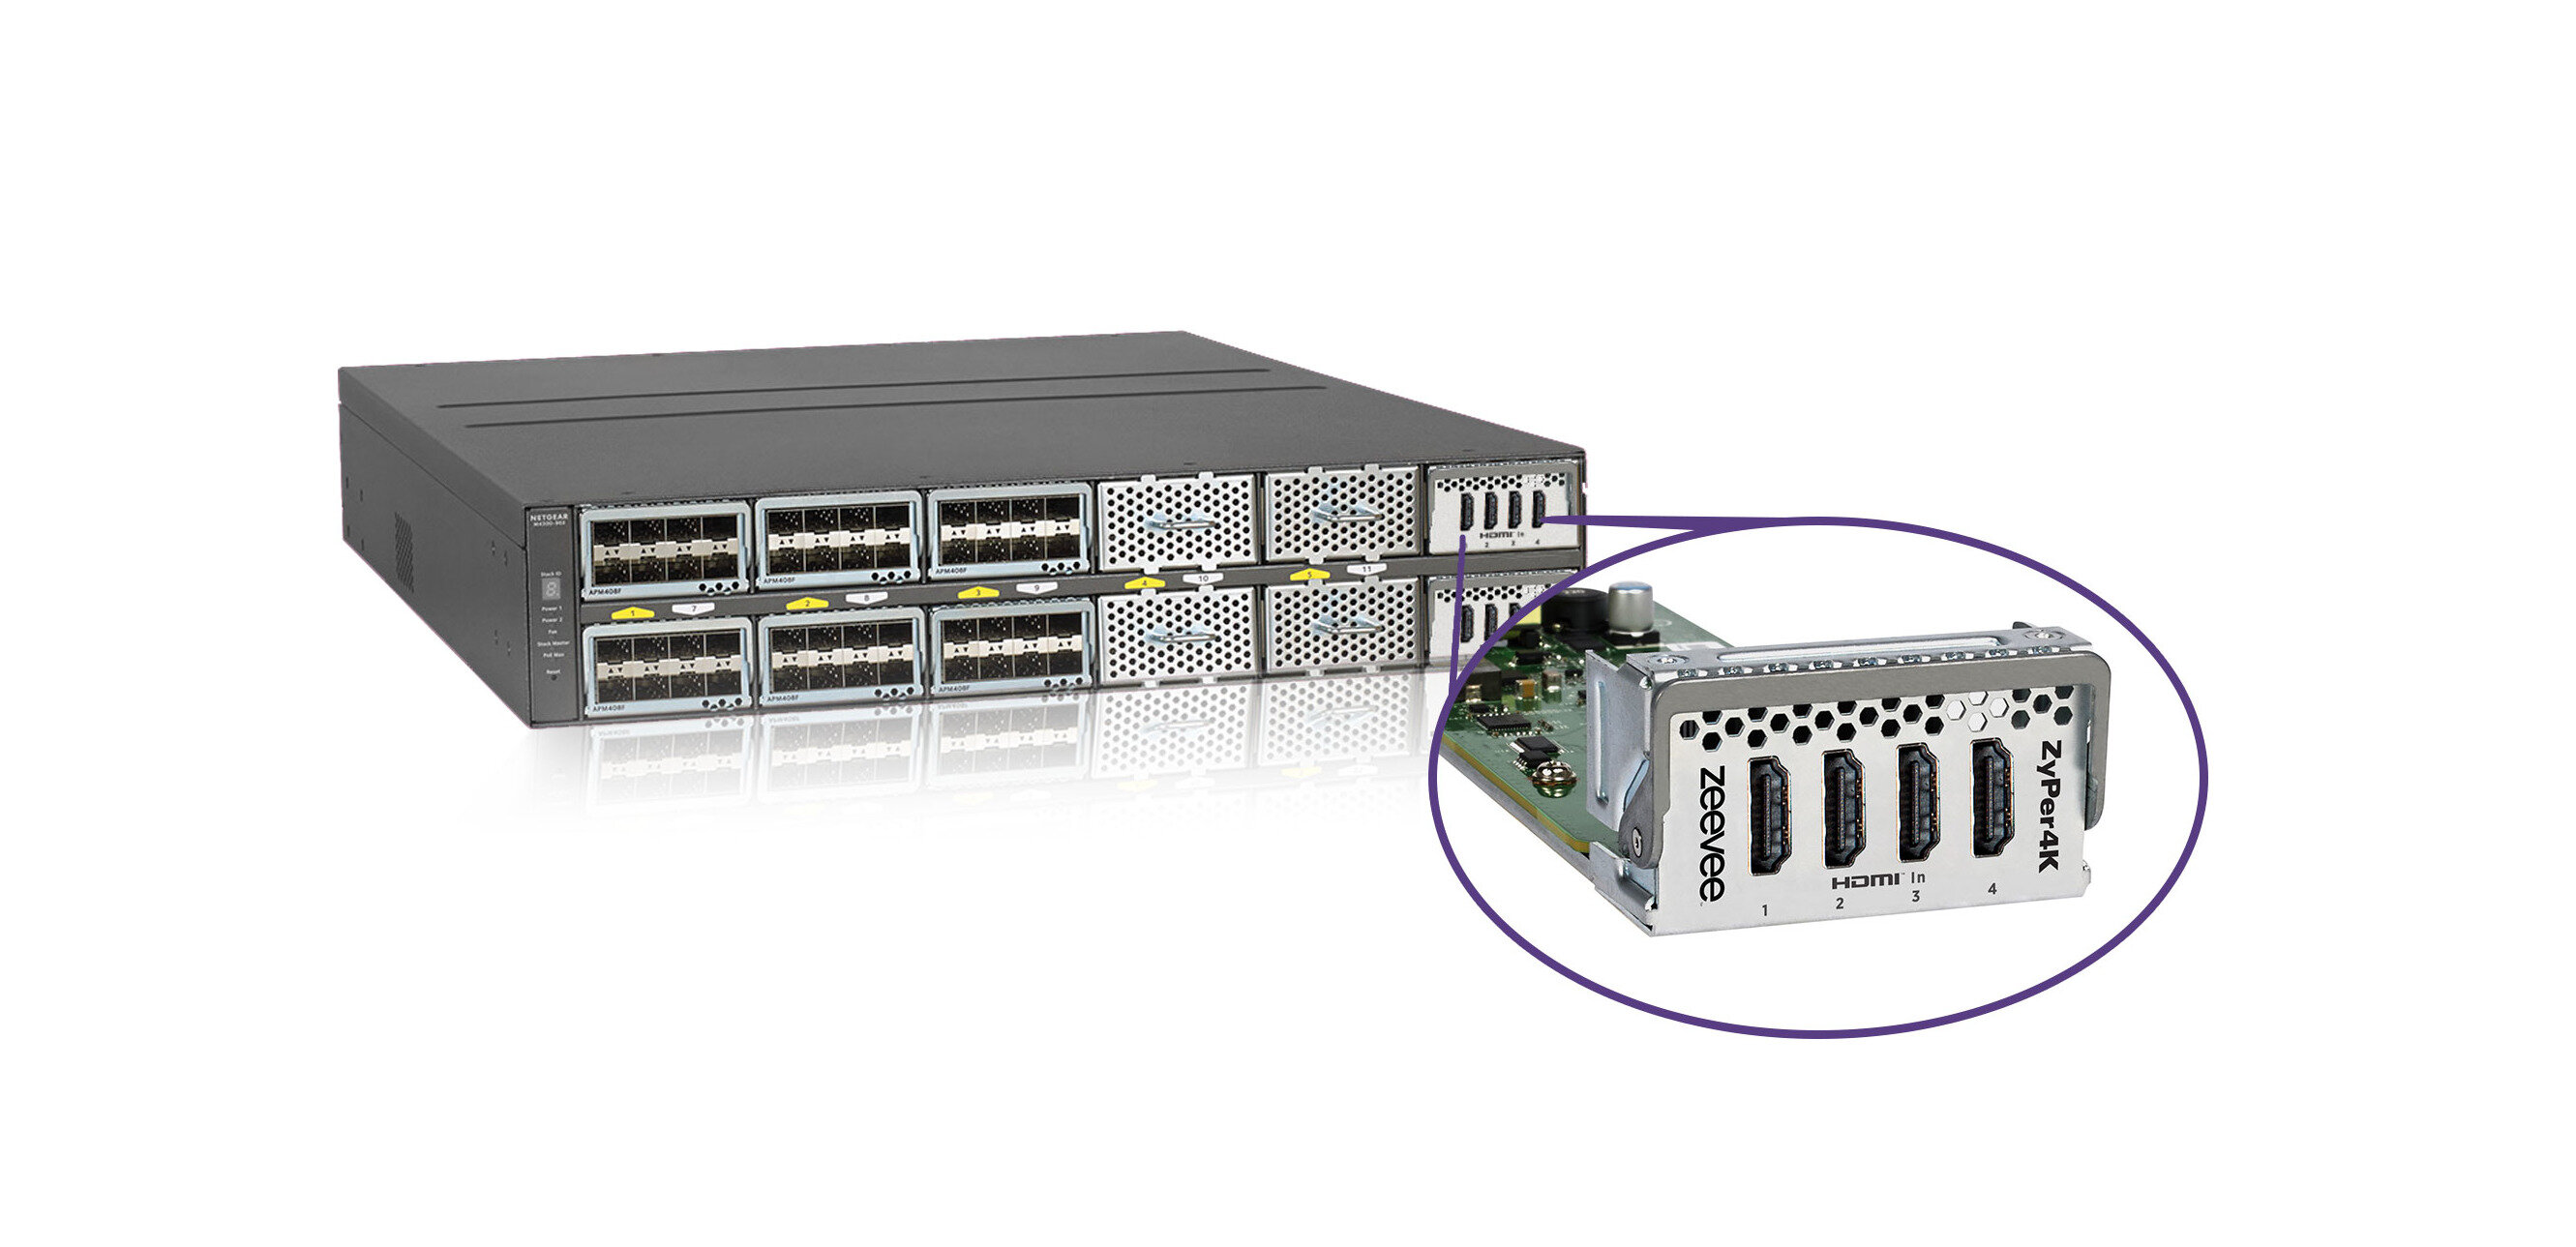 SDVoE : ZeeVee intègre des ports HDMI à un switch 10 Gb/s Netgear